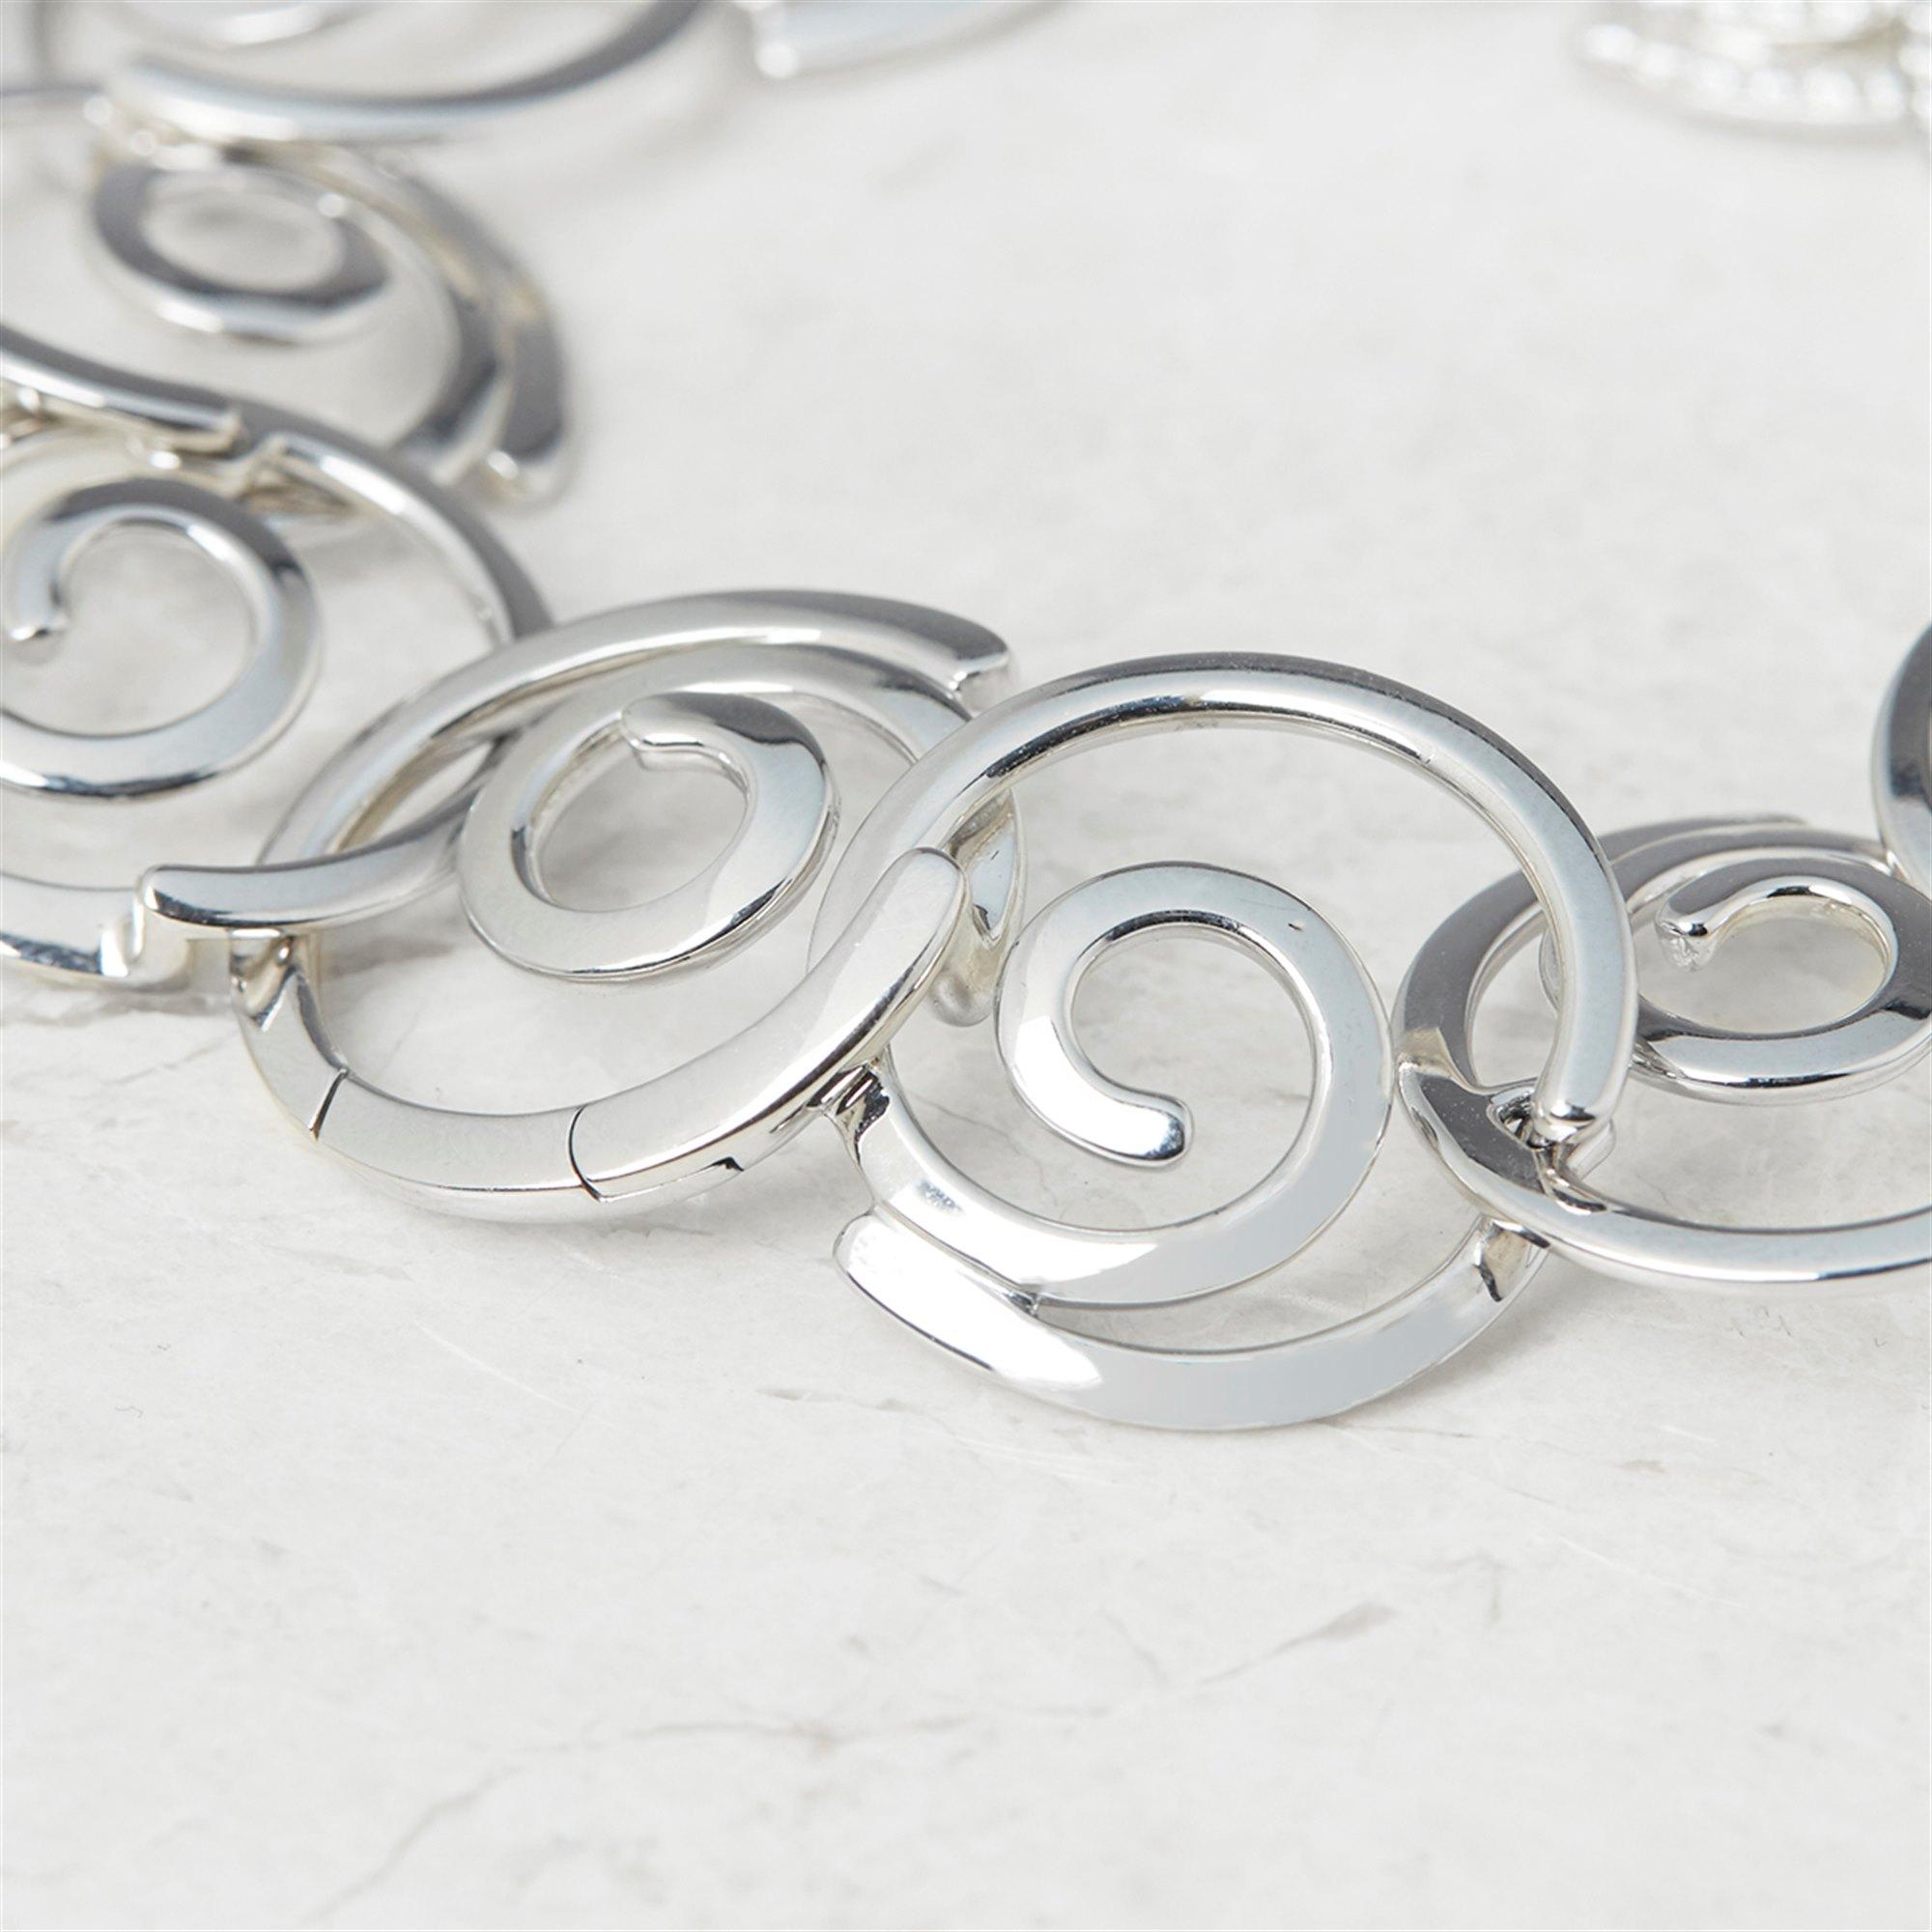 Breguet 18k White Gold Diamond Circle Link Bracelet